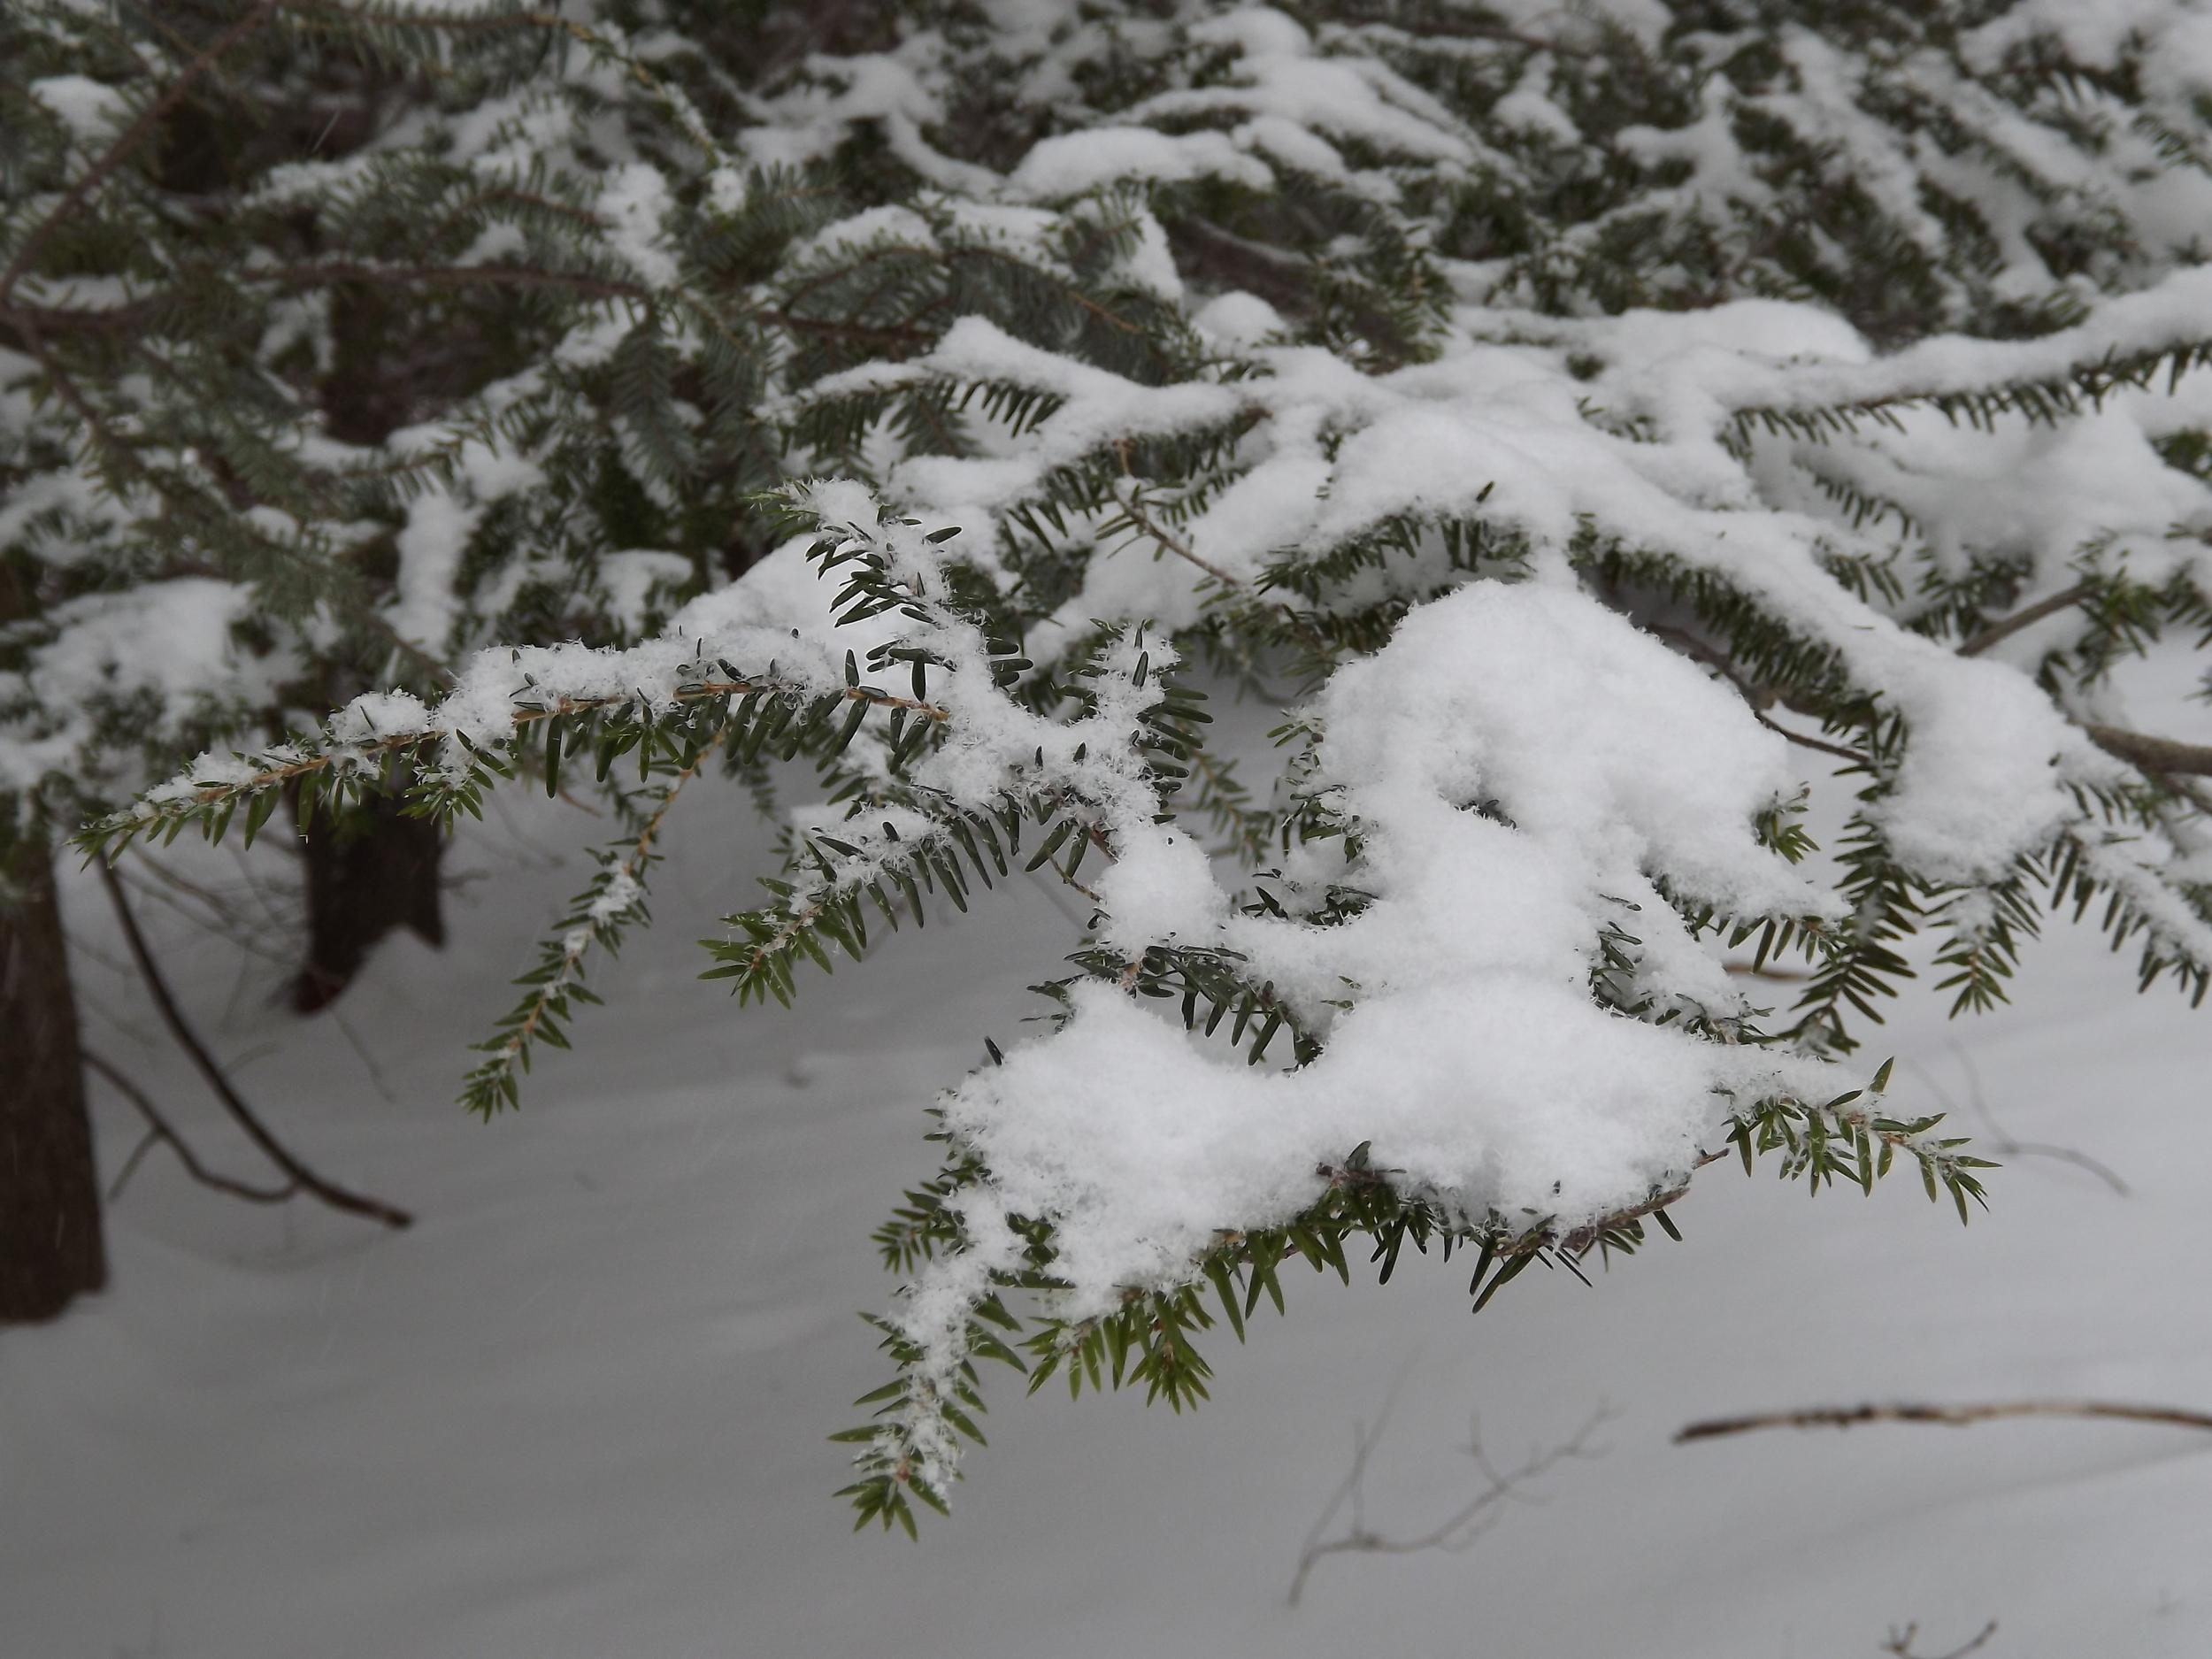 Newly fallen snow on Hemlock branches.